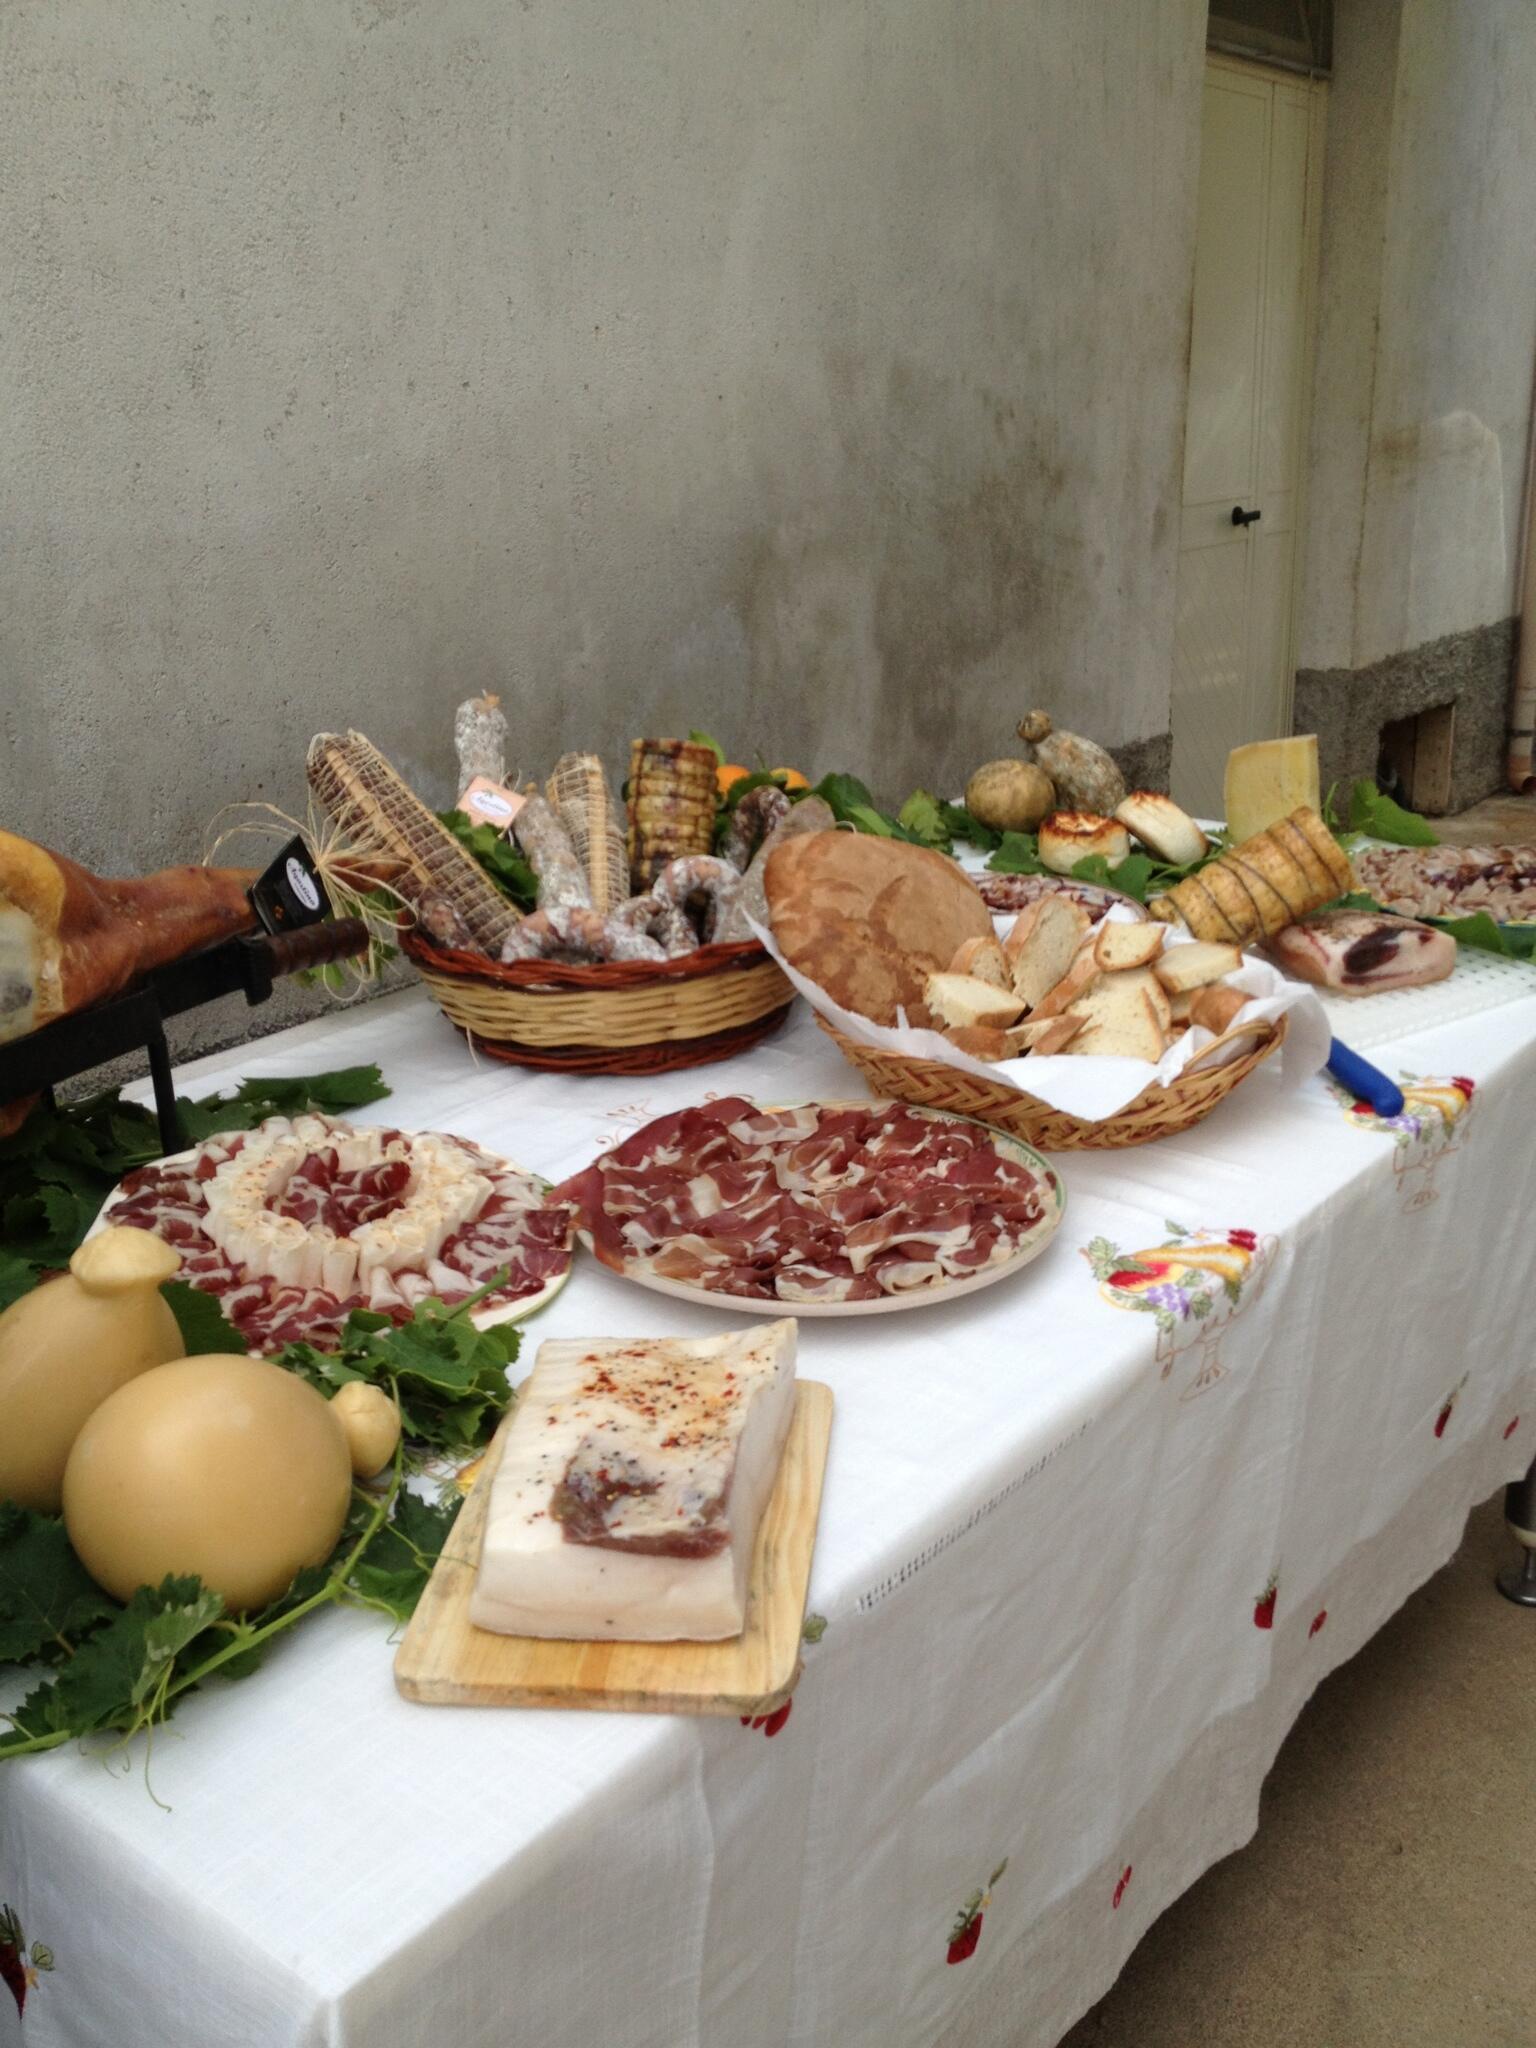 Sicily http://t.co/vi2KCdNa2Y